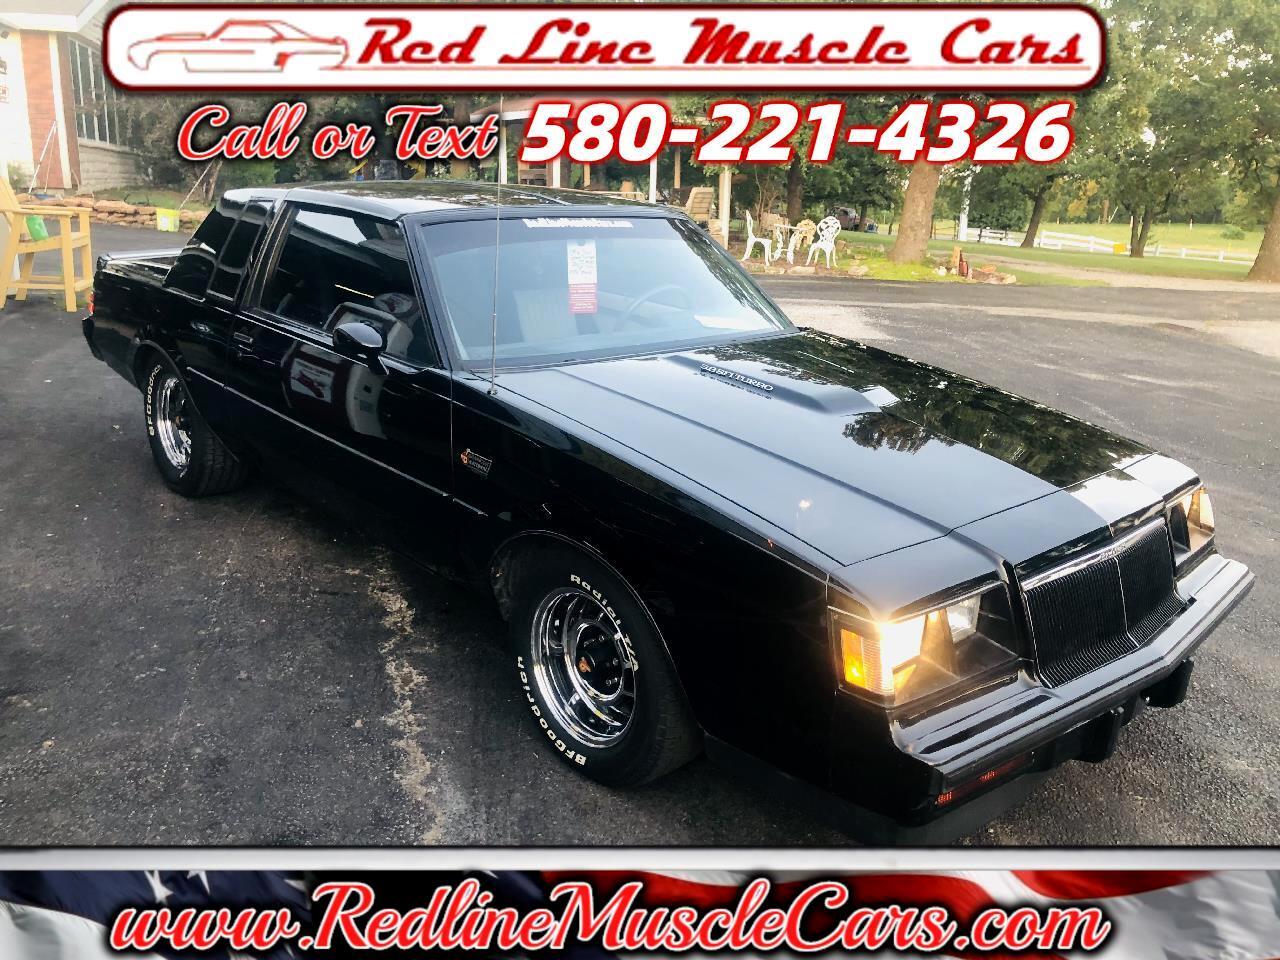 Buick Regal T-Type 1986